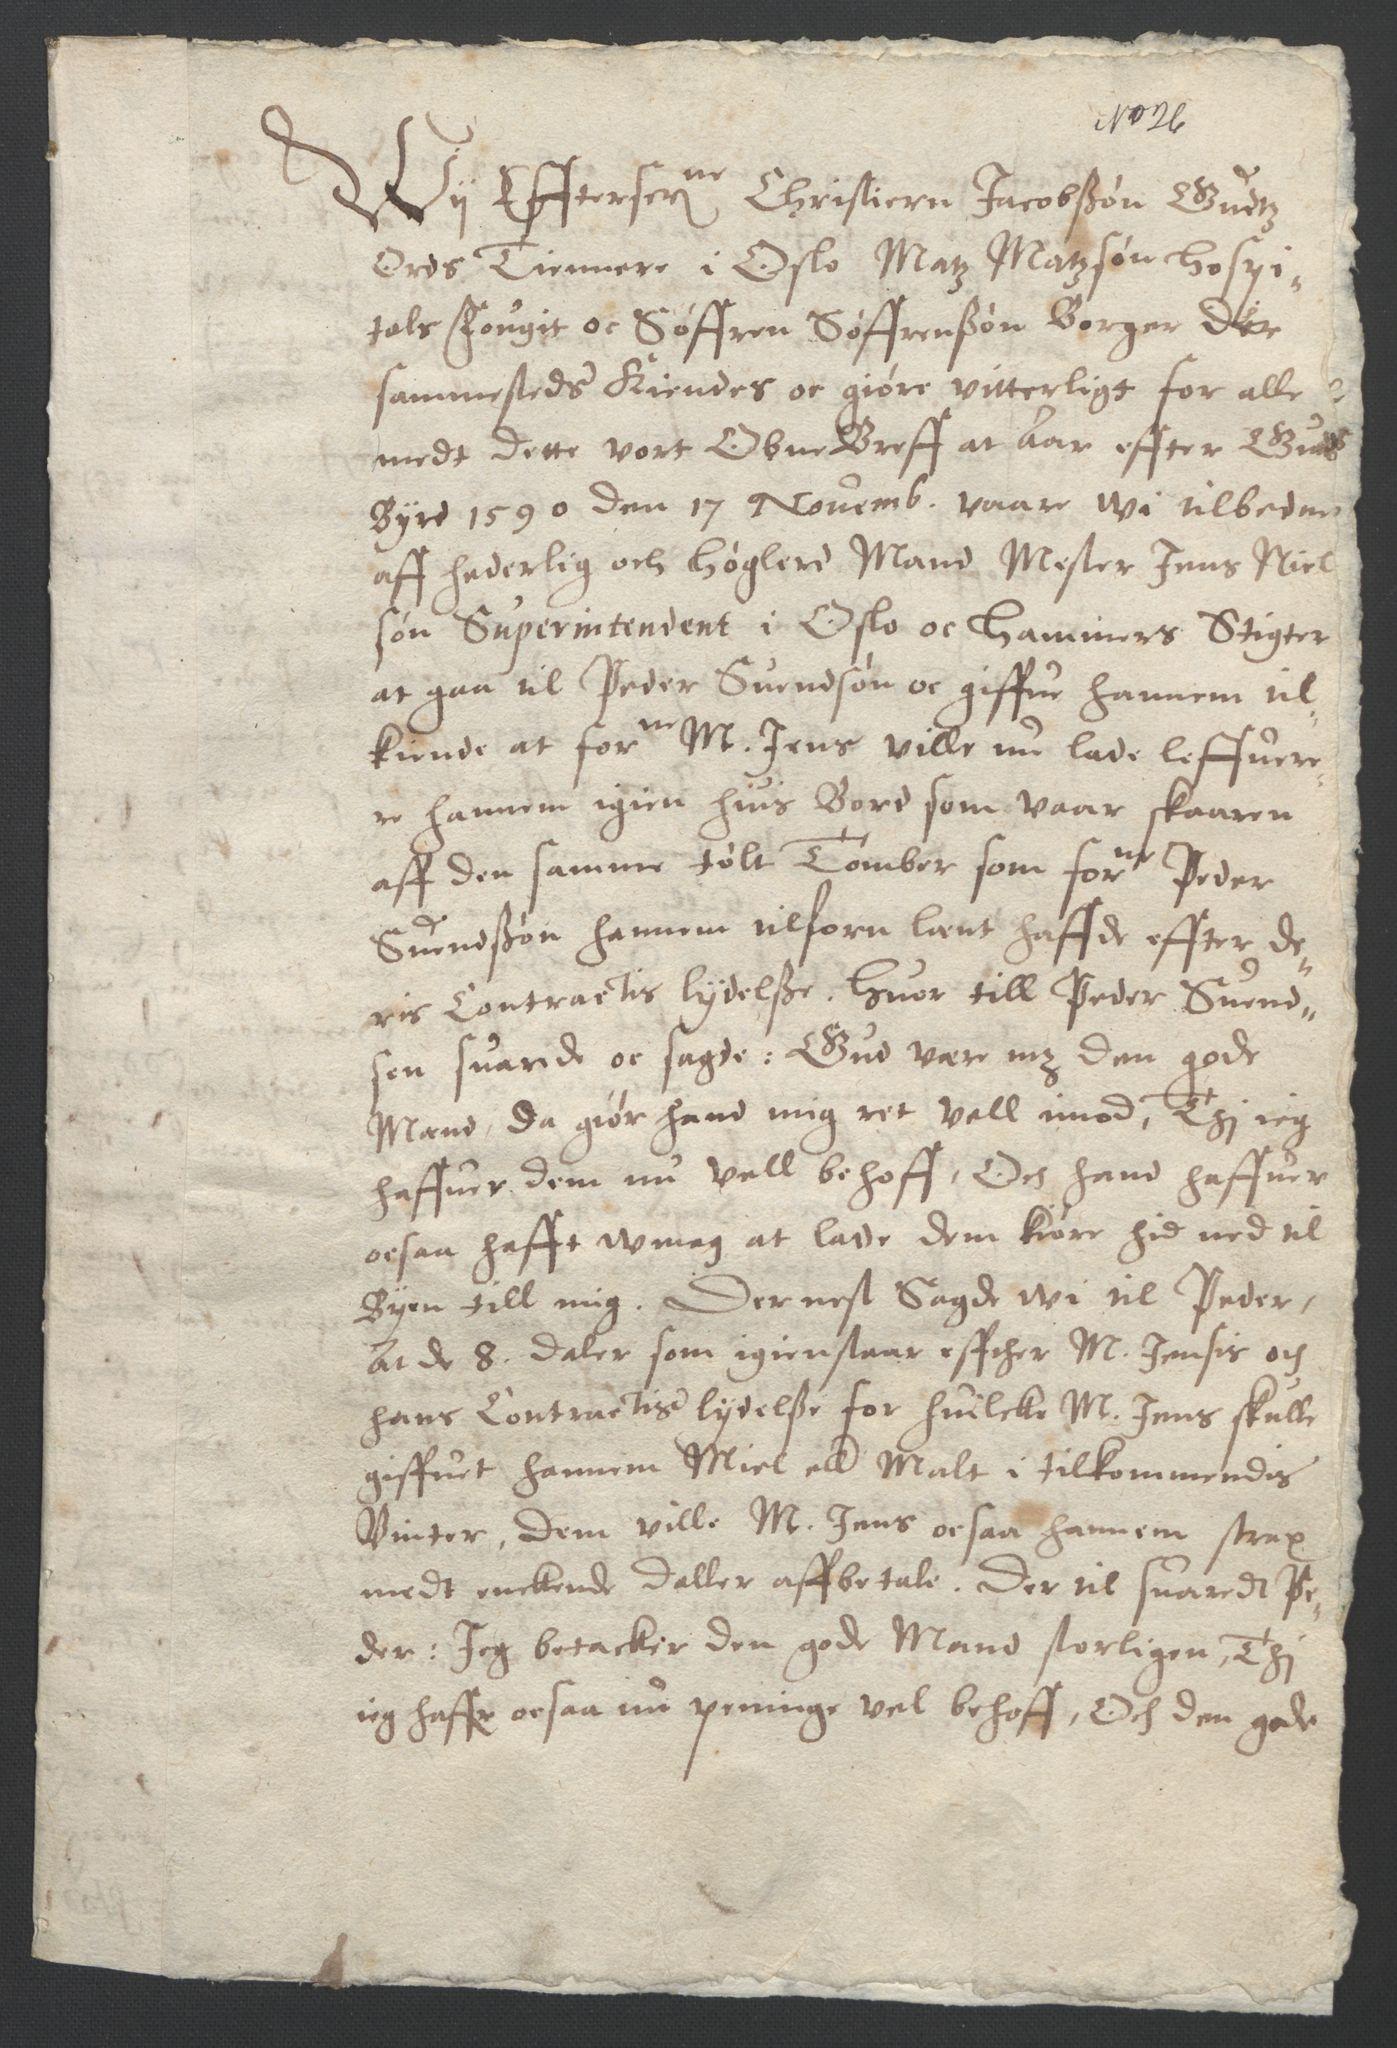 SAO, Oslo stiftsdireksjon, G/Gb/L0001: Bispestolens dokumenter, 1584-1612, s. 26